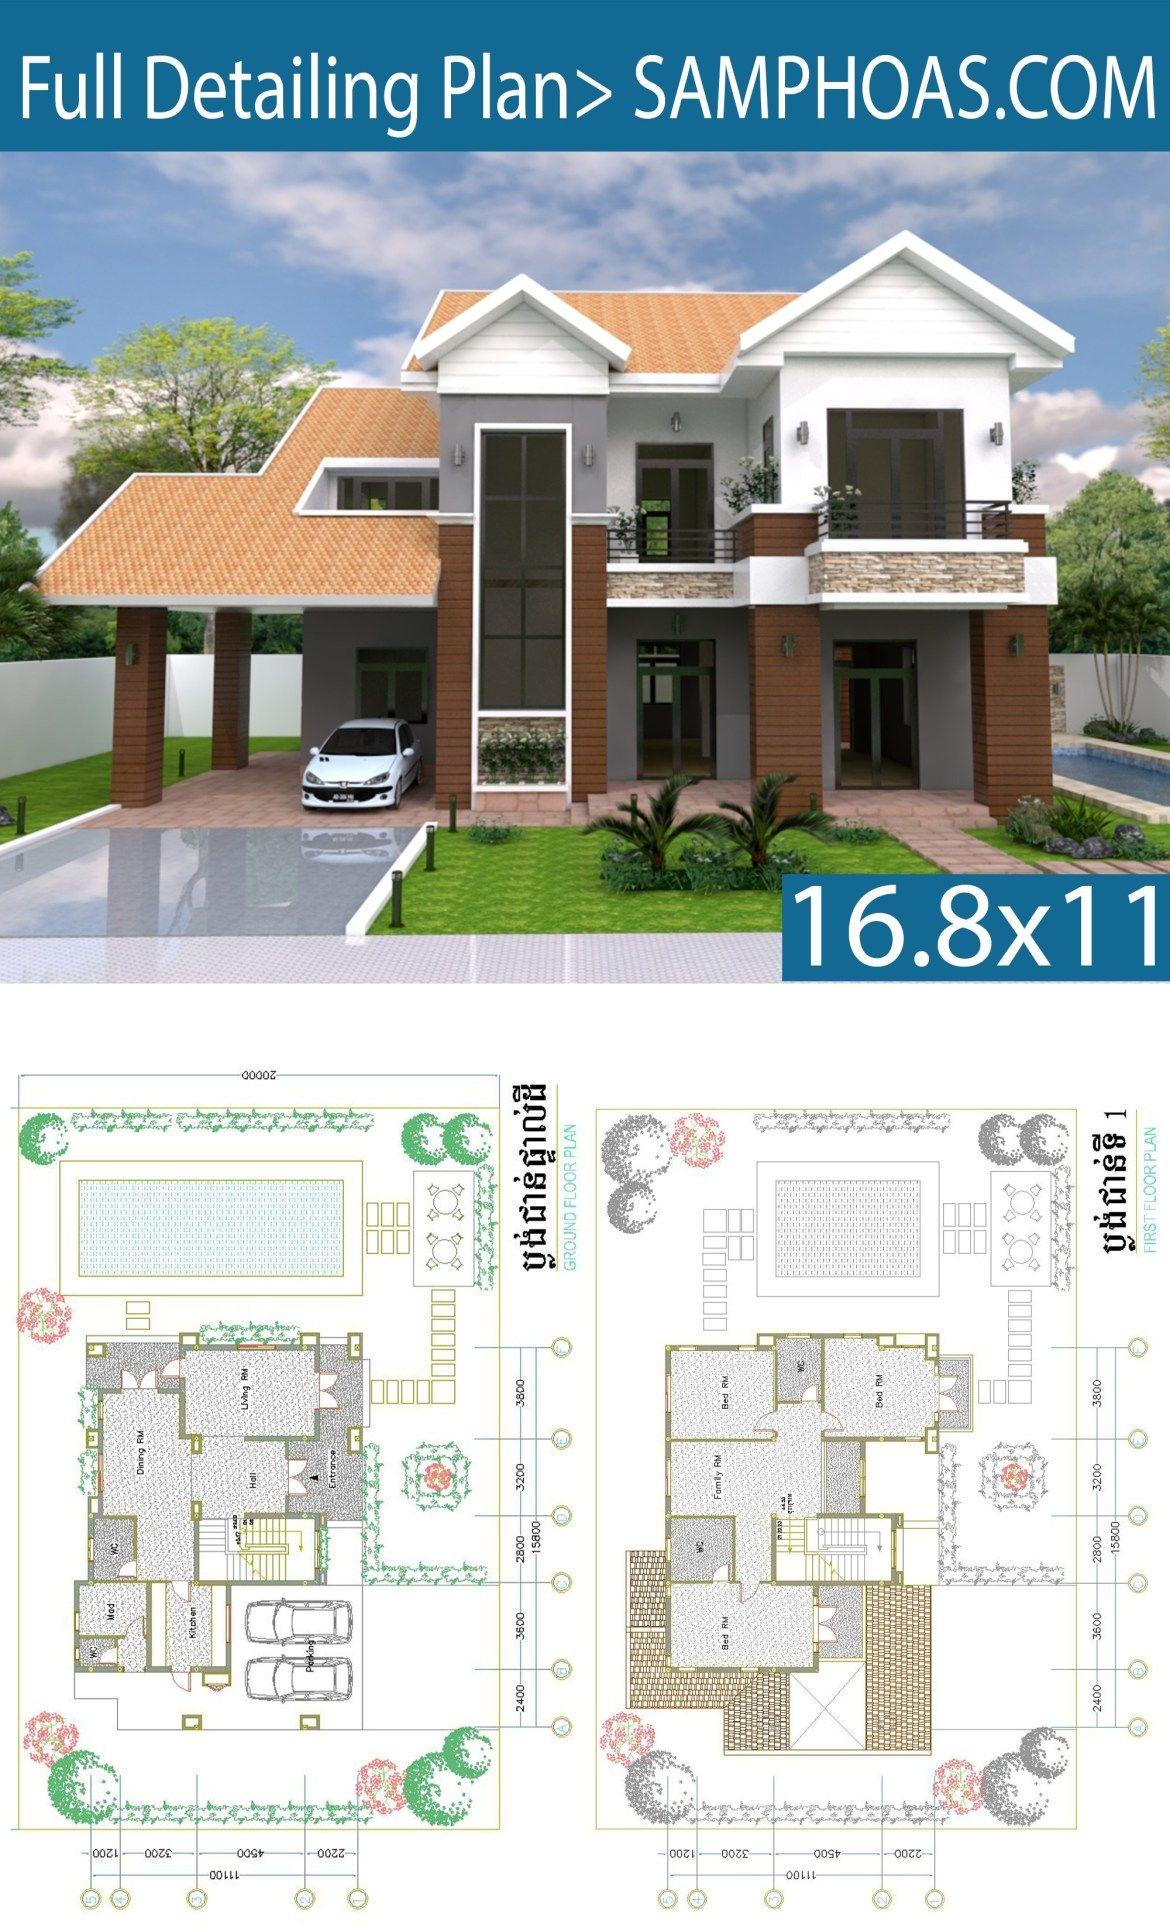 3 Bedroom Villa Design 16 8x11m Samphoas Plansearch Villa Design House Architecture Design House Design